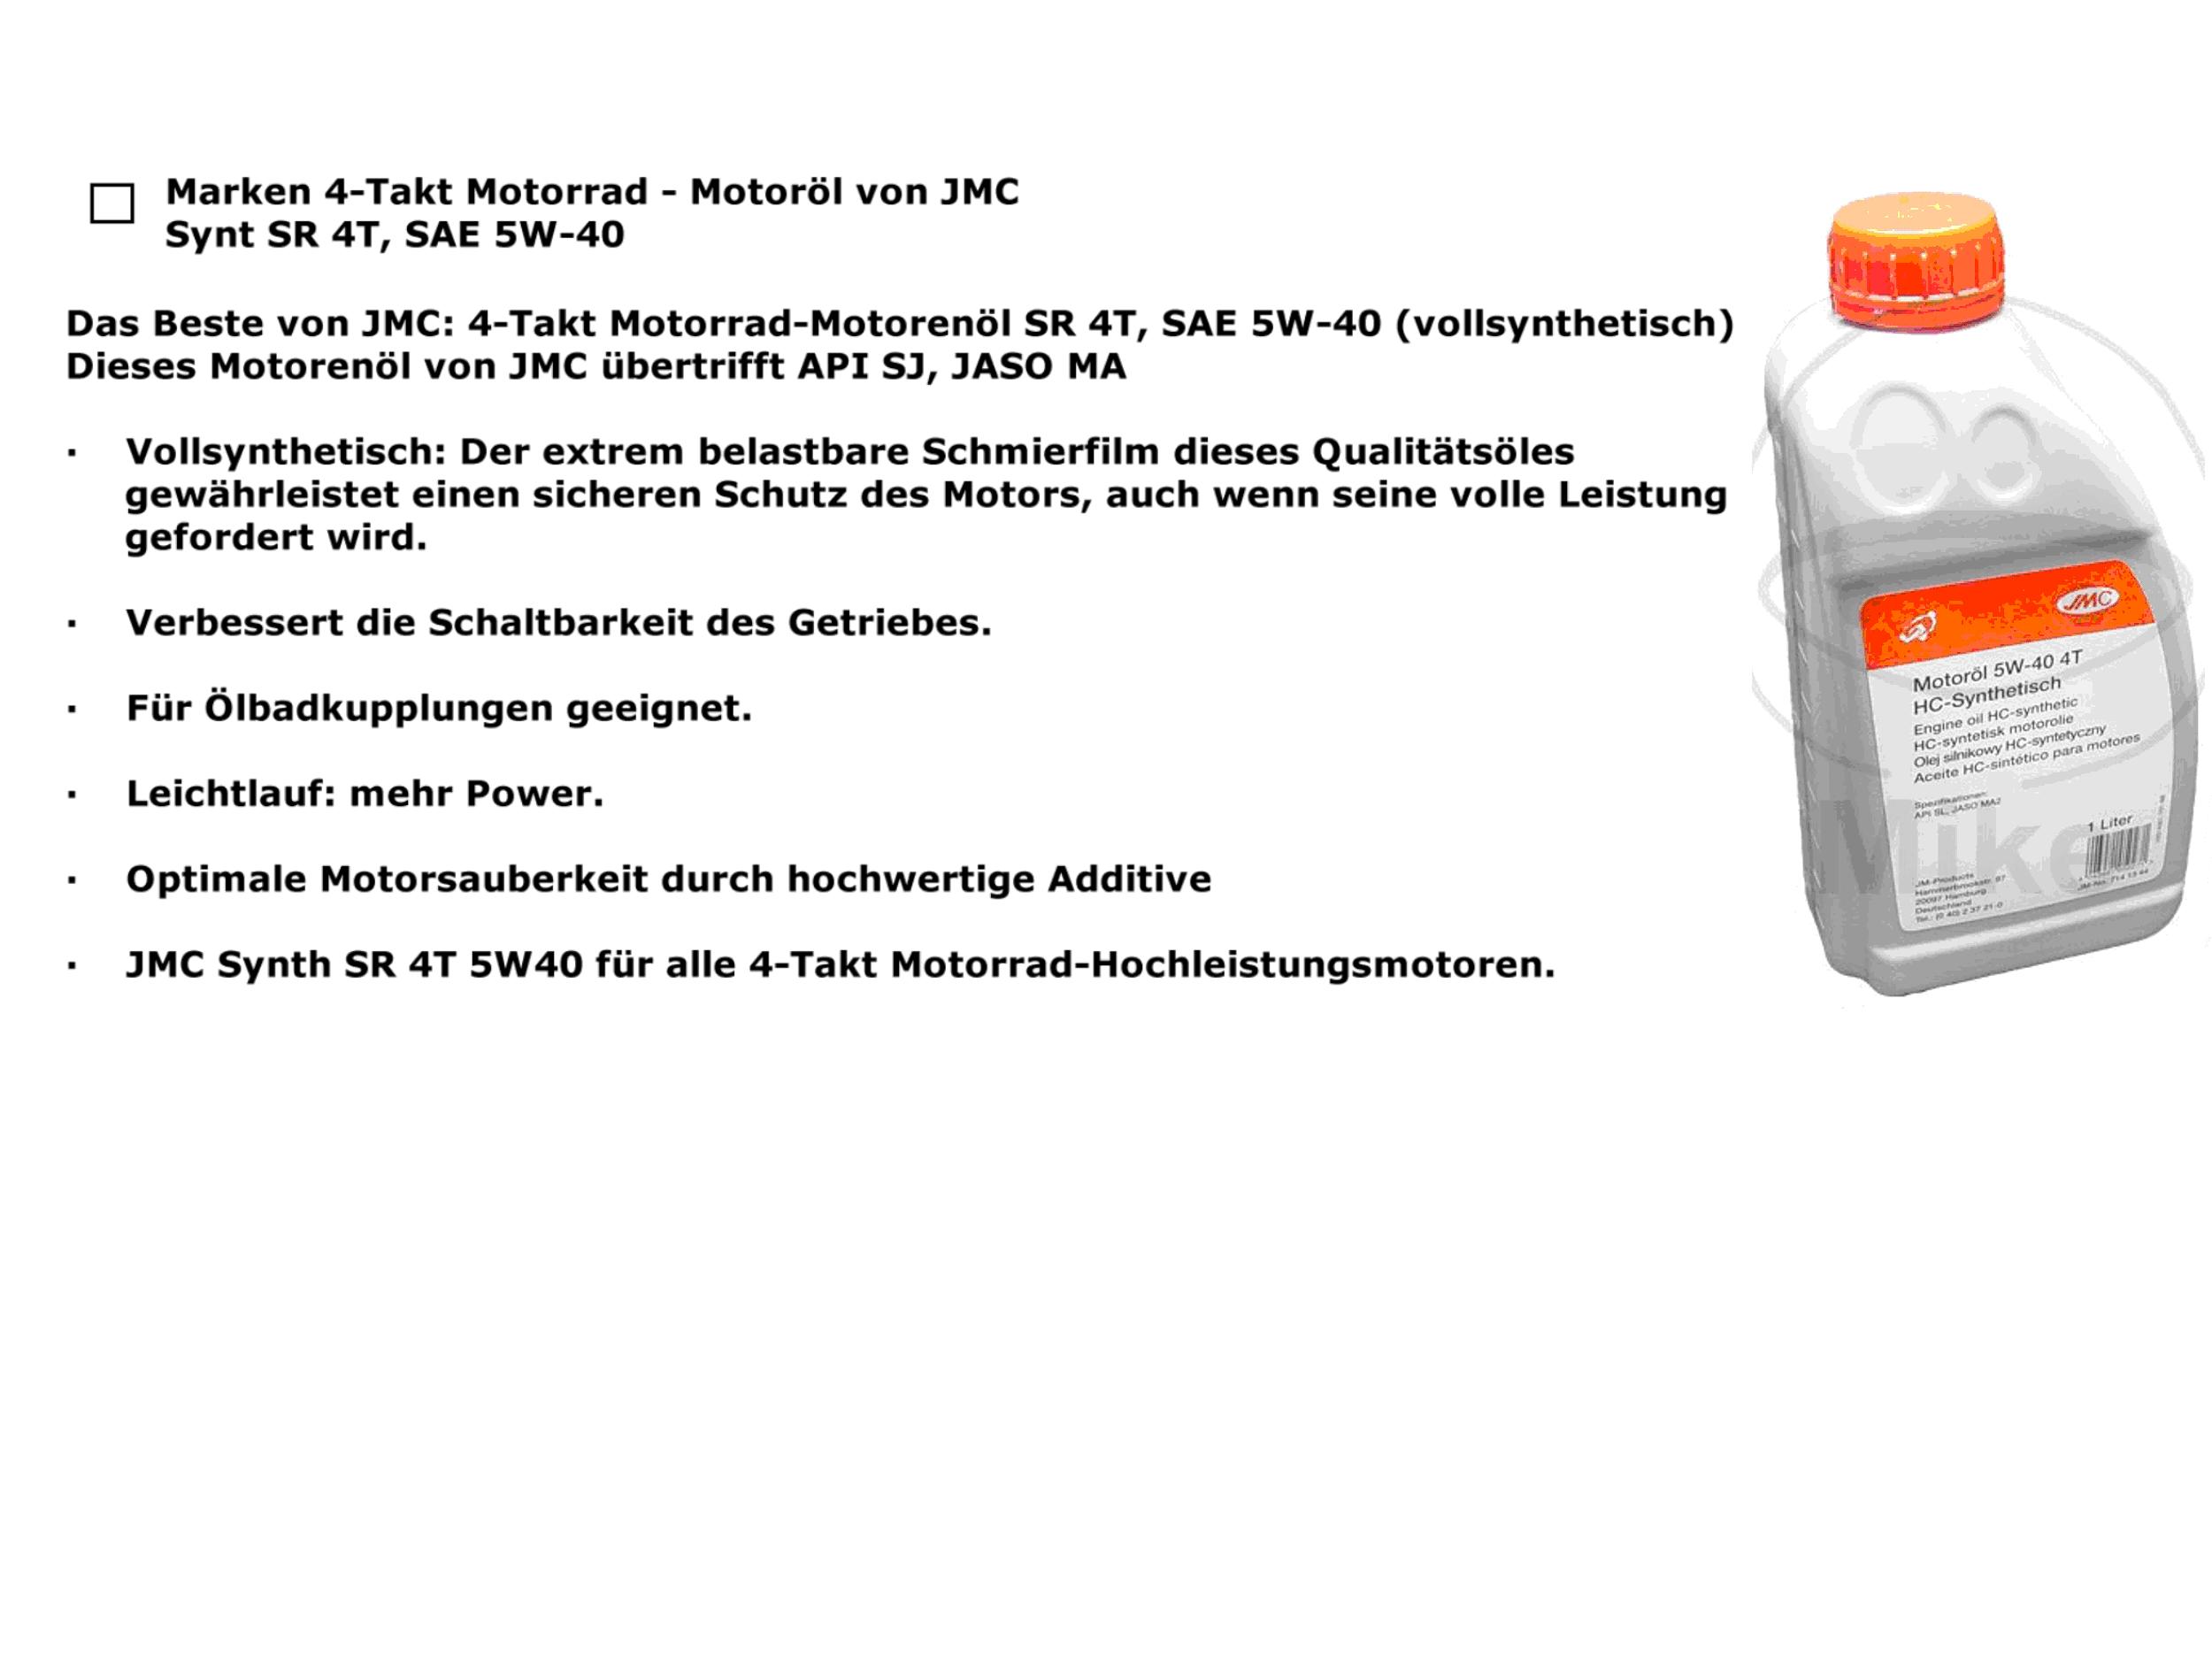 4-T 5W40 vollsynthetisch